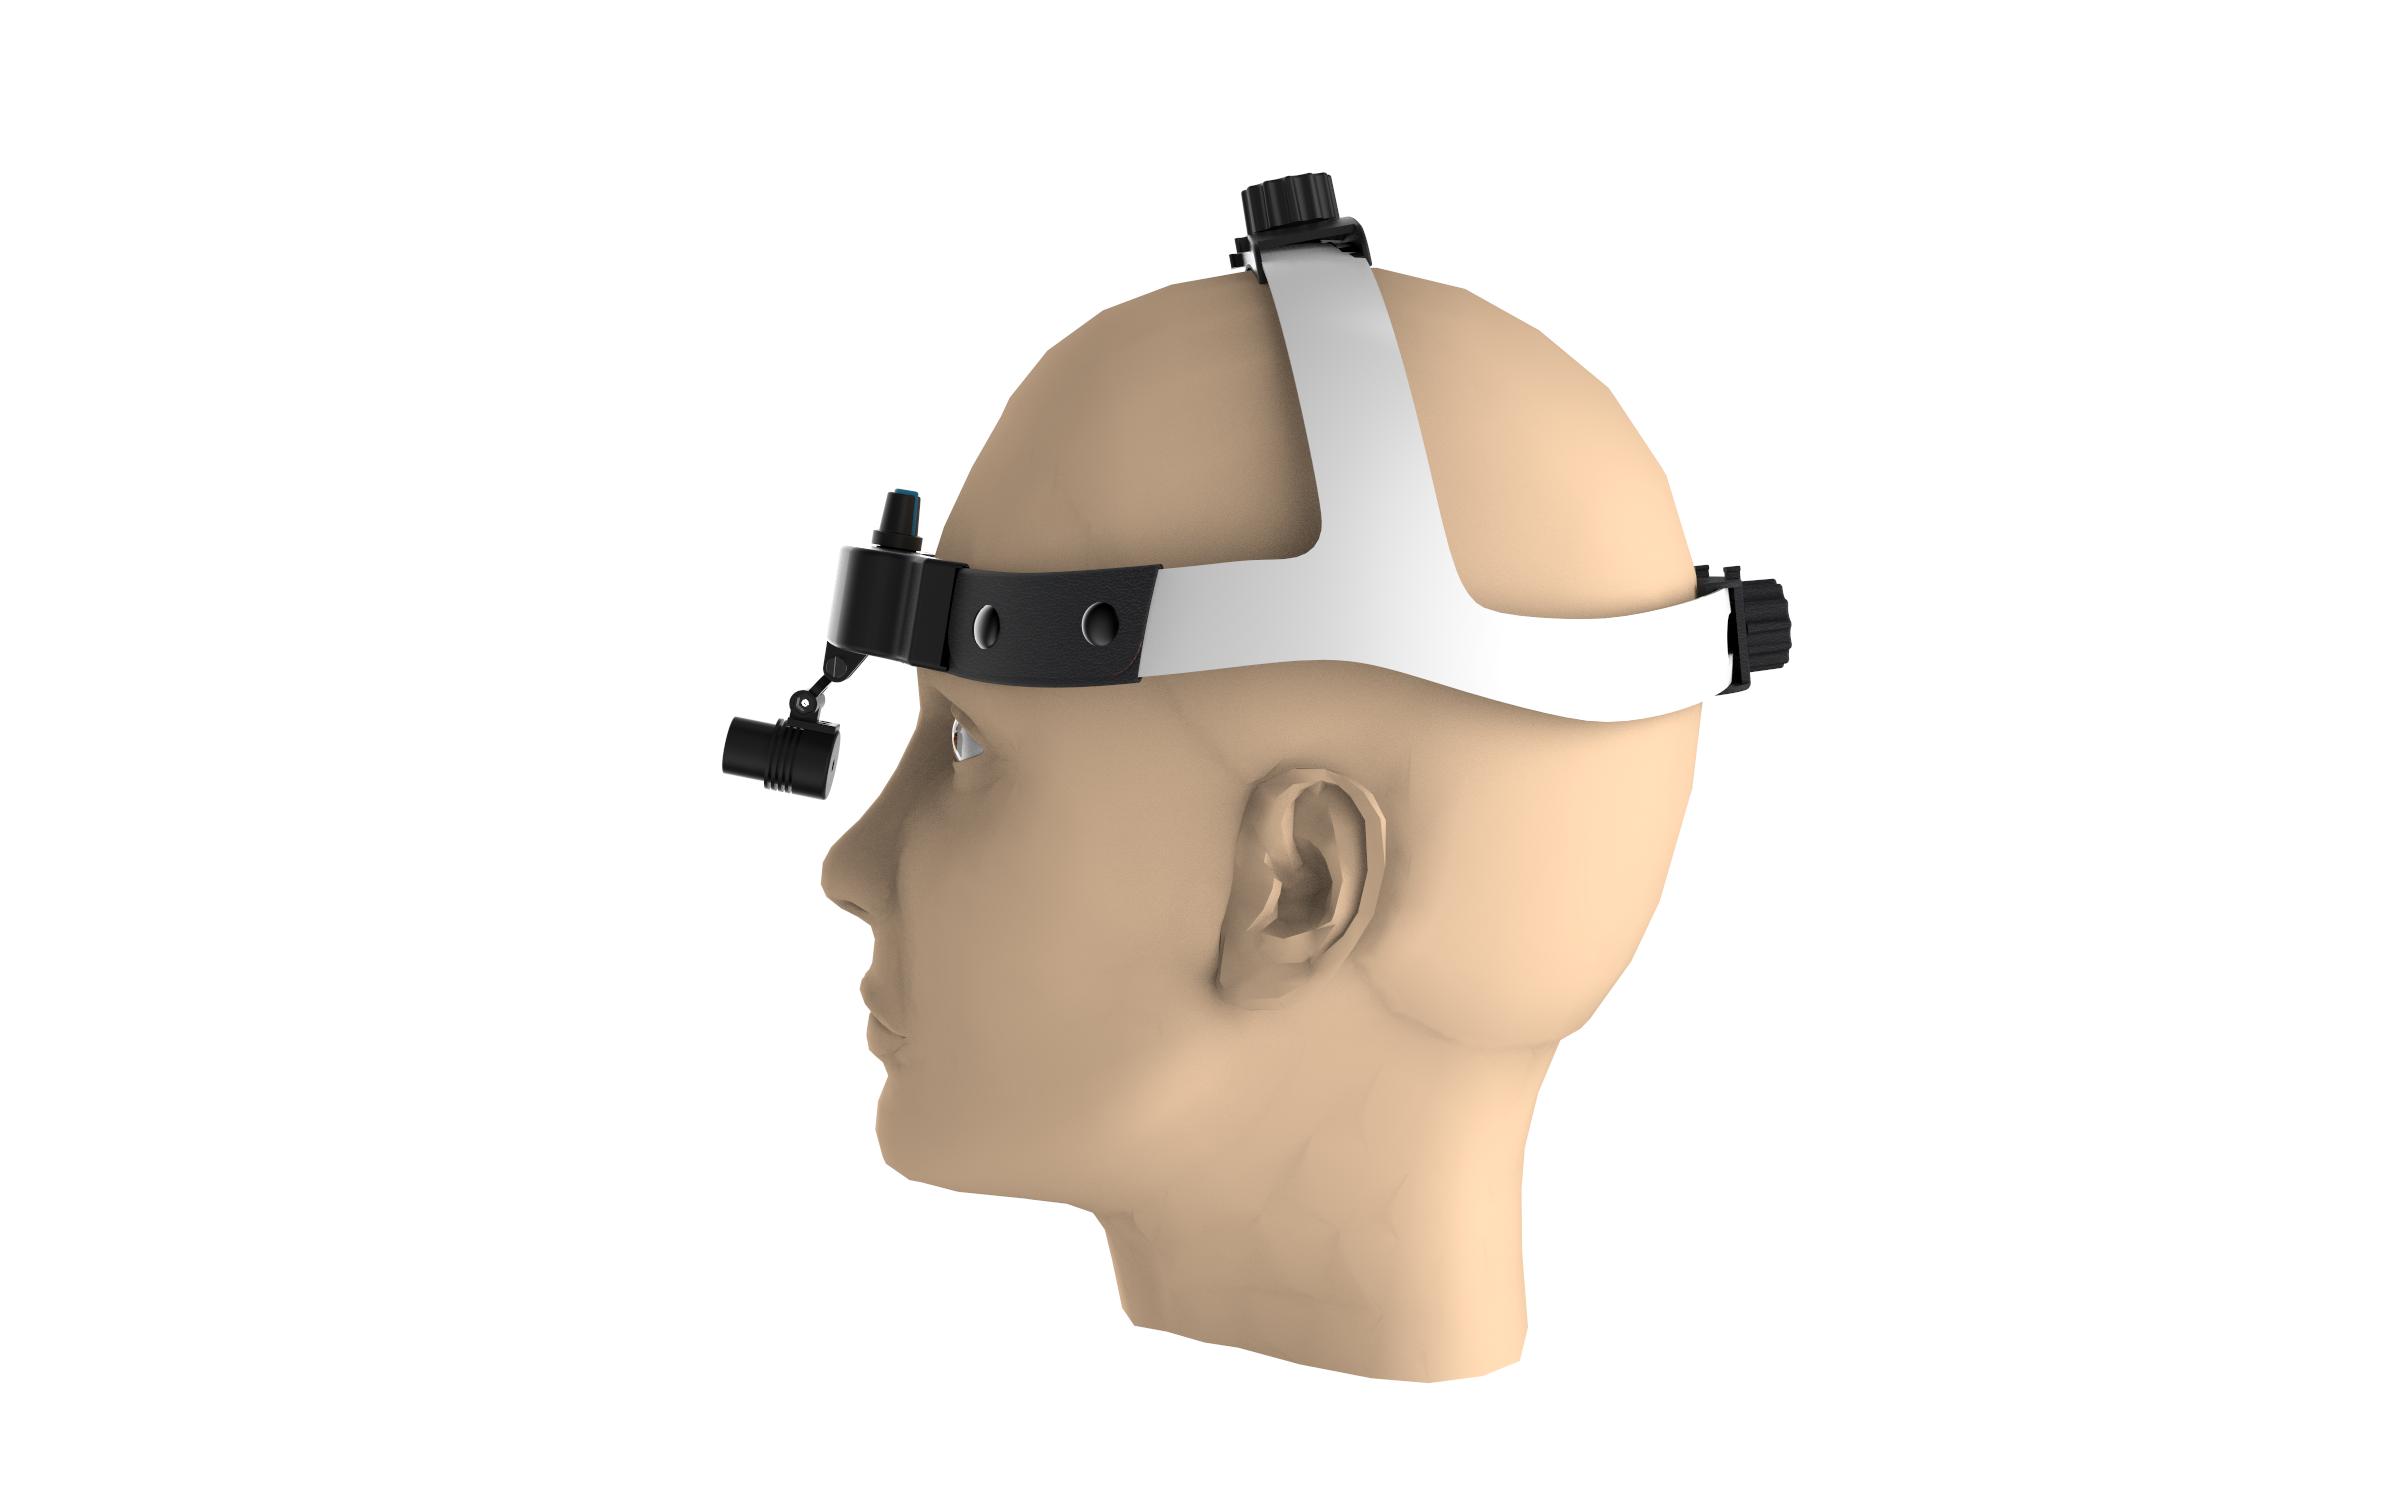 3W Rechargeable High Intensity Headlamp Dental Operation Helmet Lamp LED Wireless Headlight(TD-M06B-F) enlarge